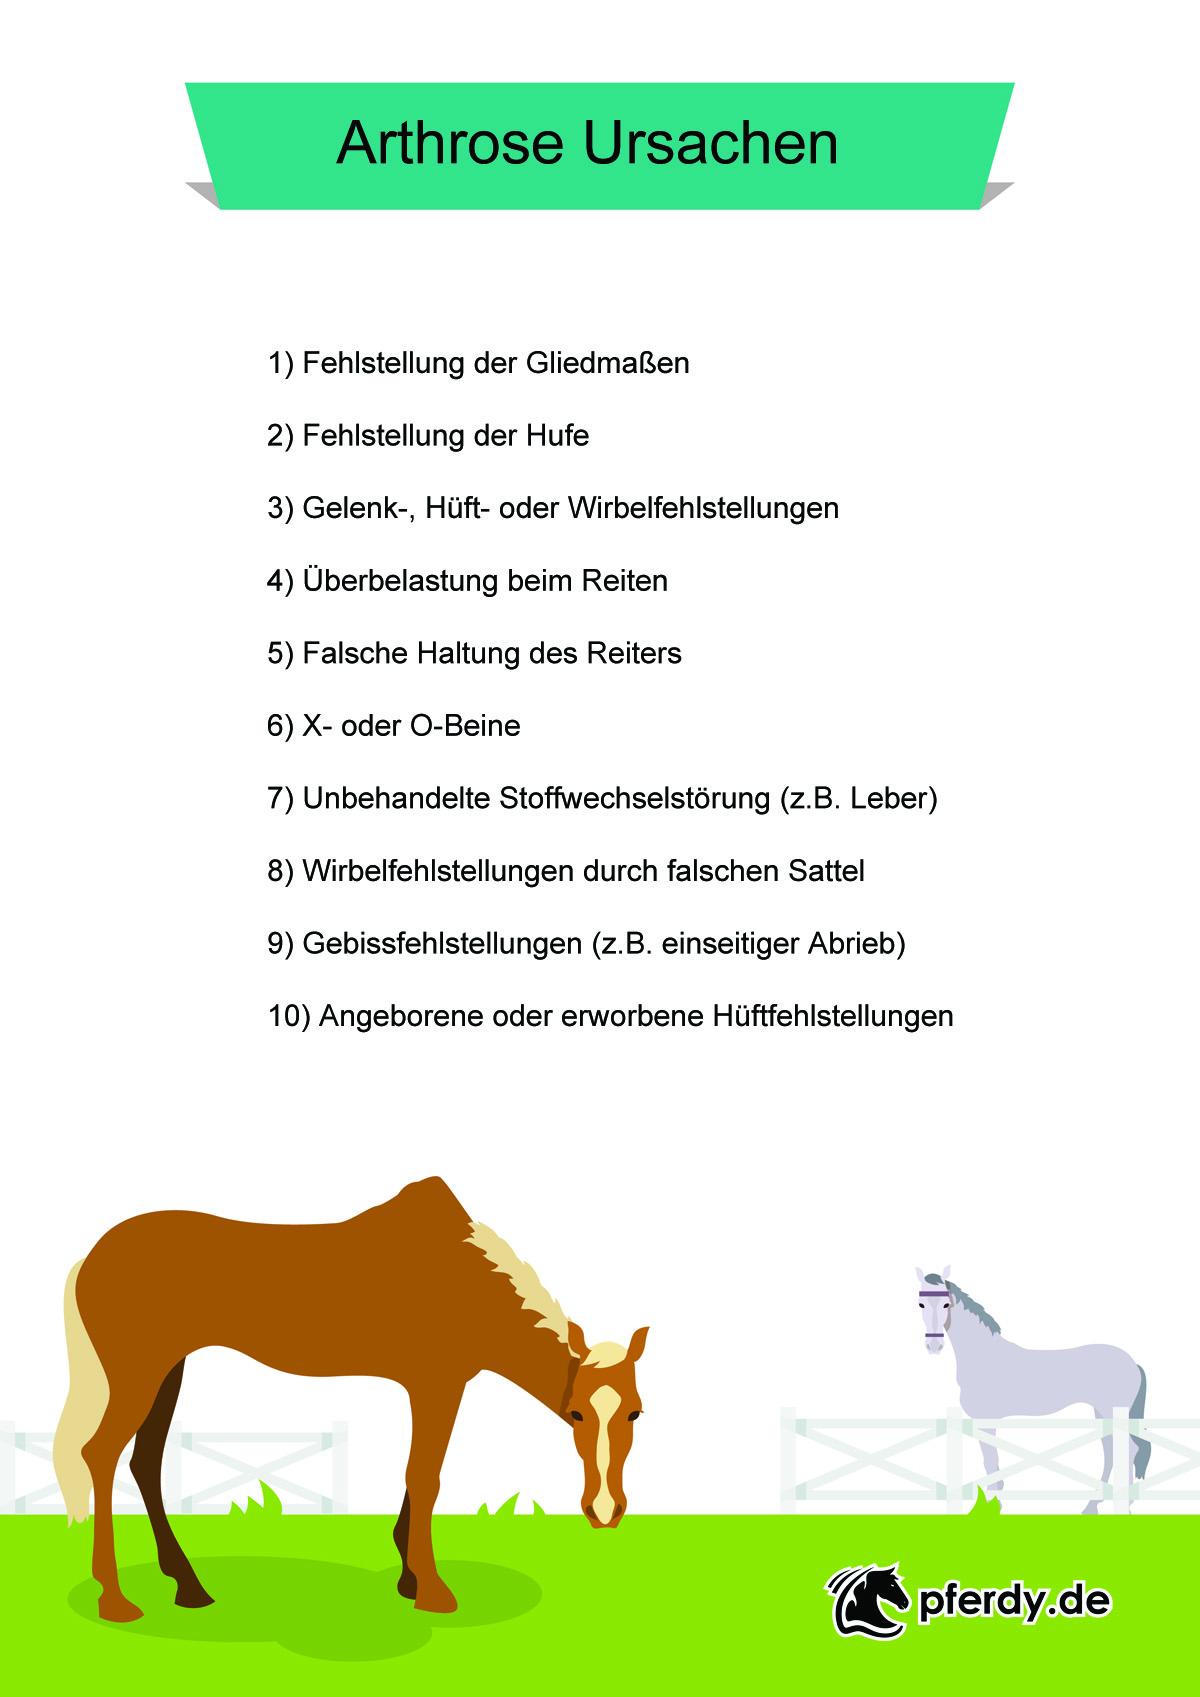 Arthrose Pferd Ursachen